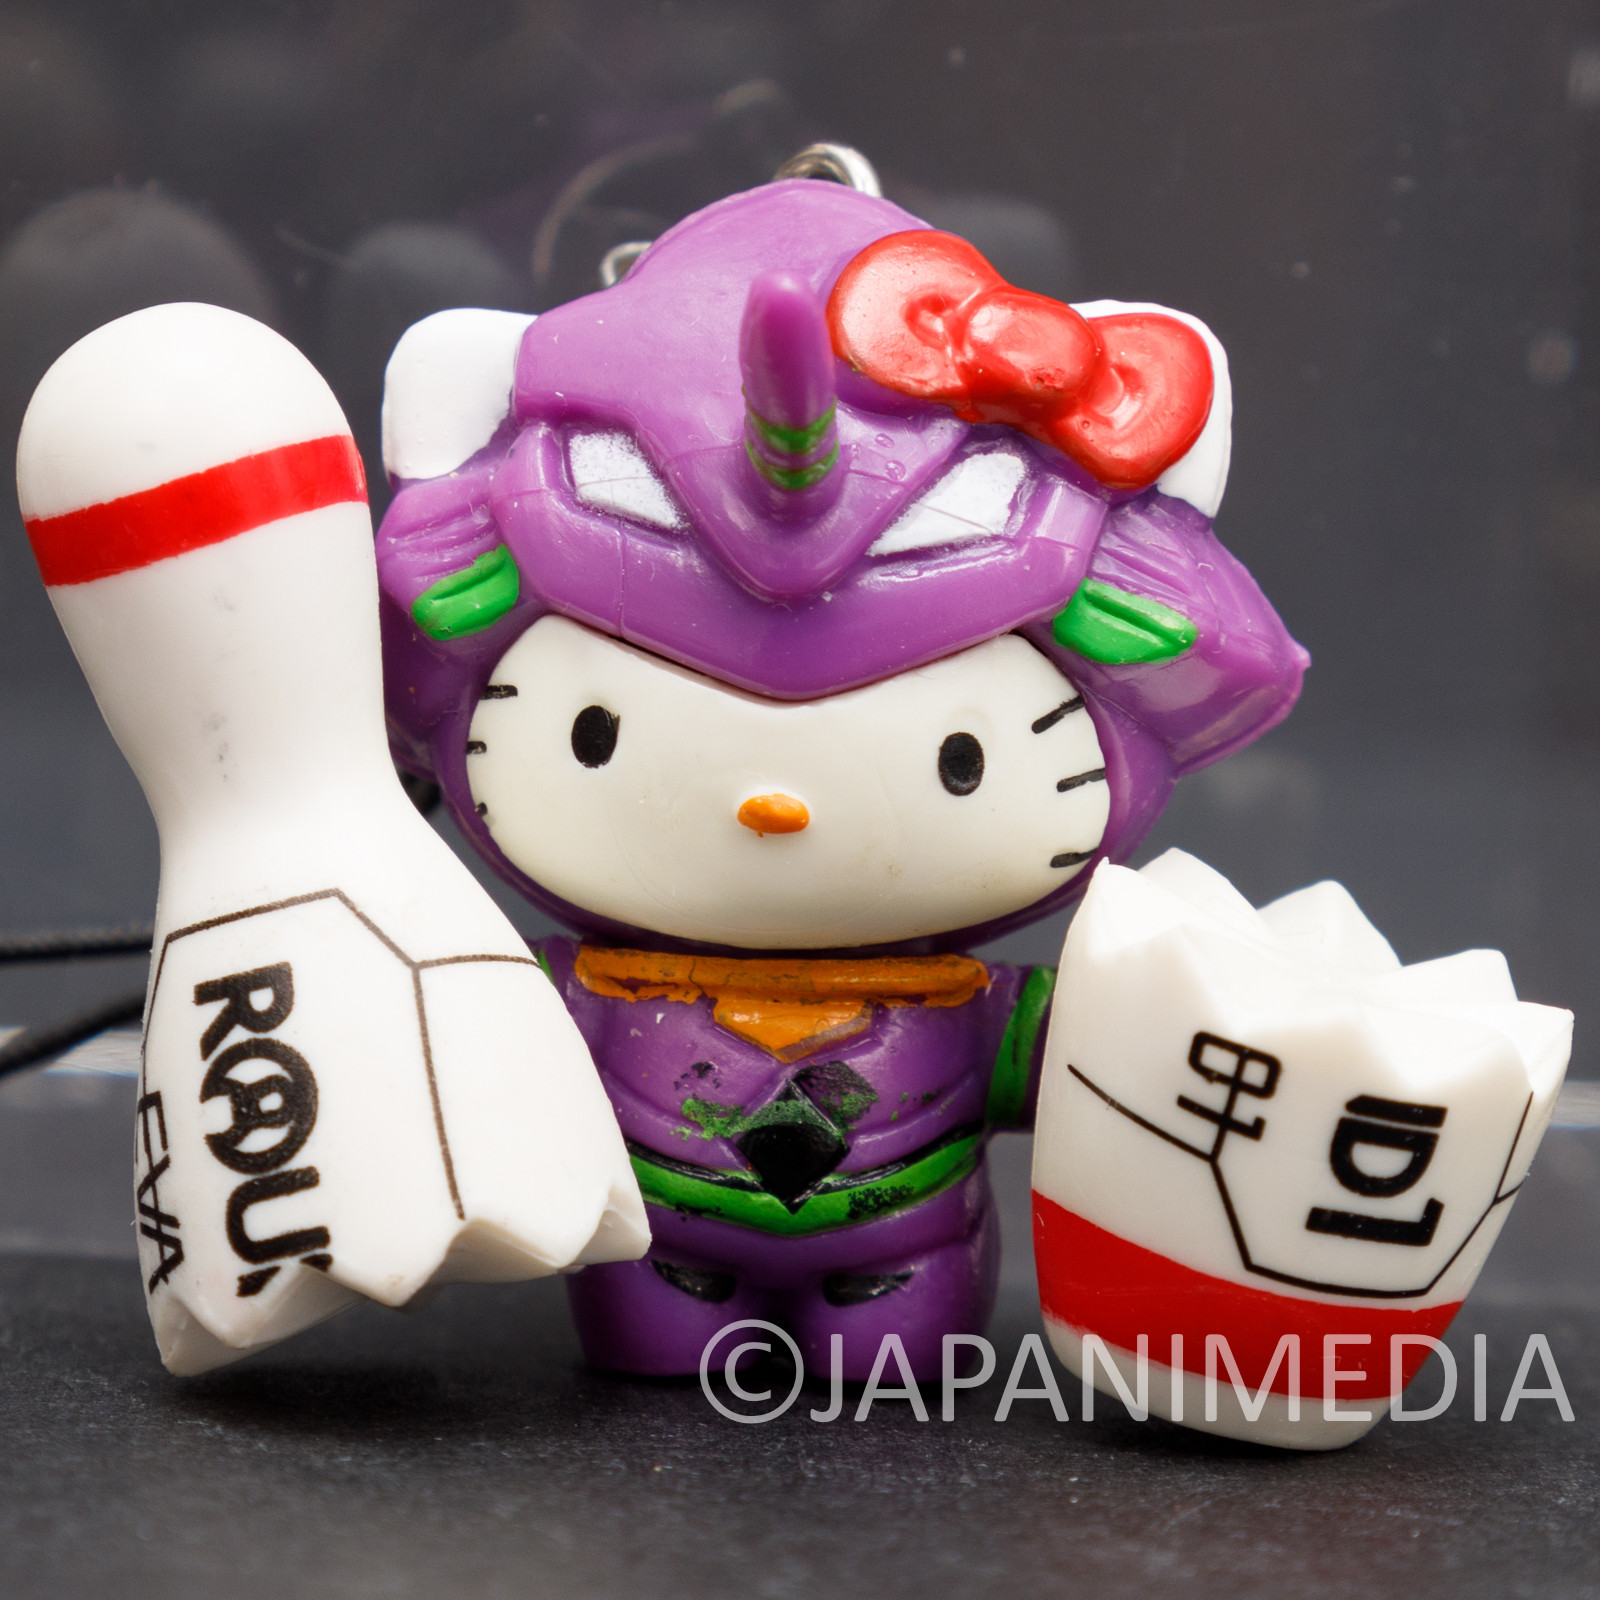 Evangelion EVA-01 x Hello Kitty with Bowling Pin Figure Strap JAPAN